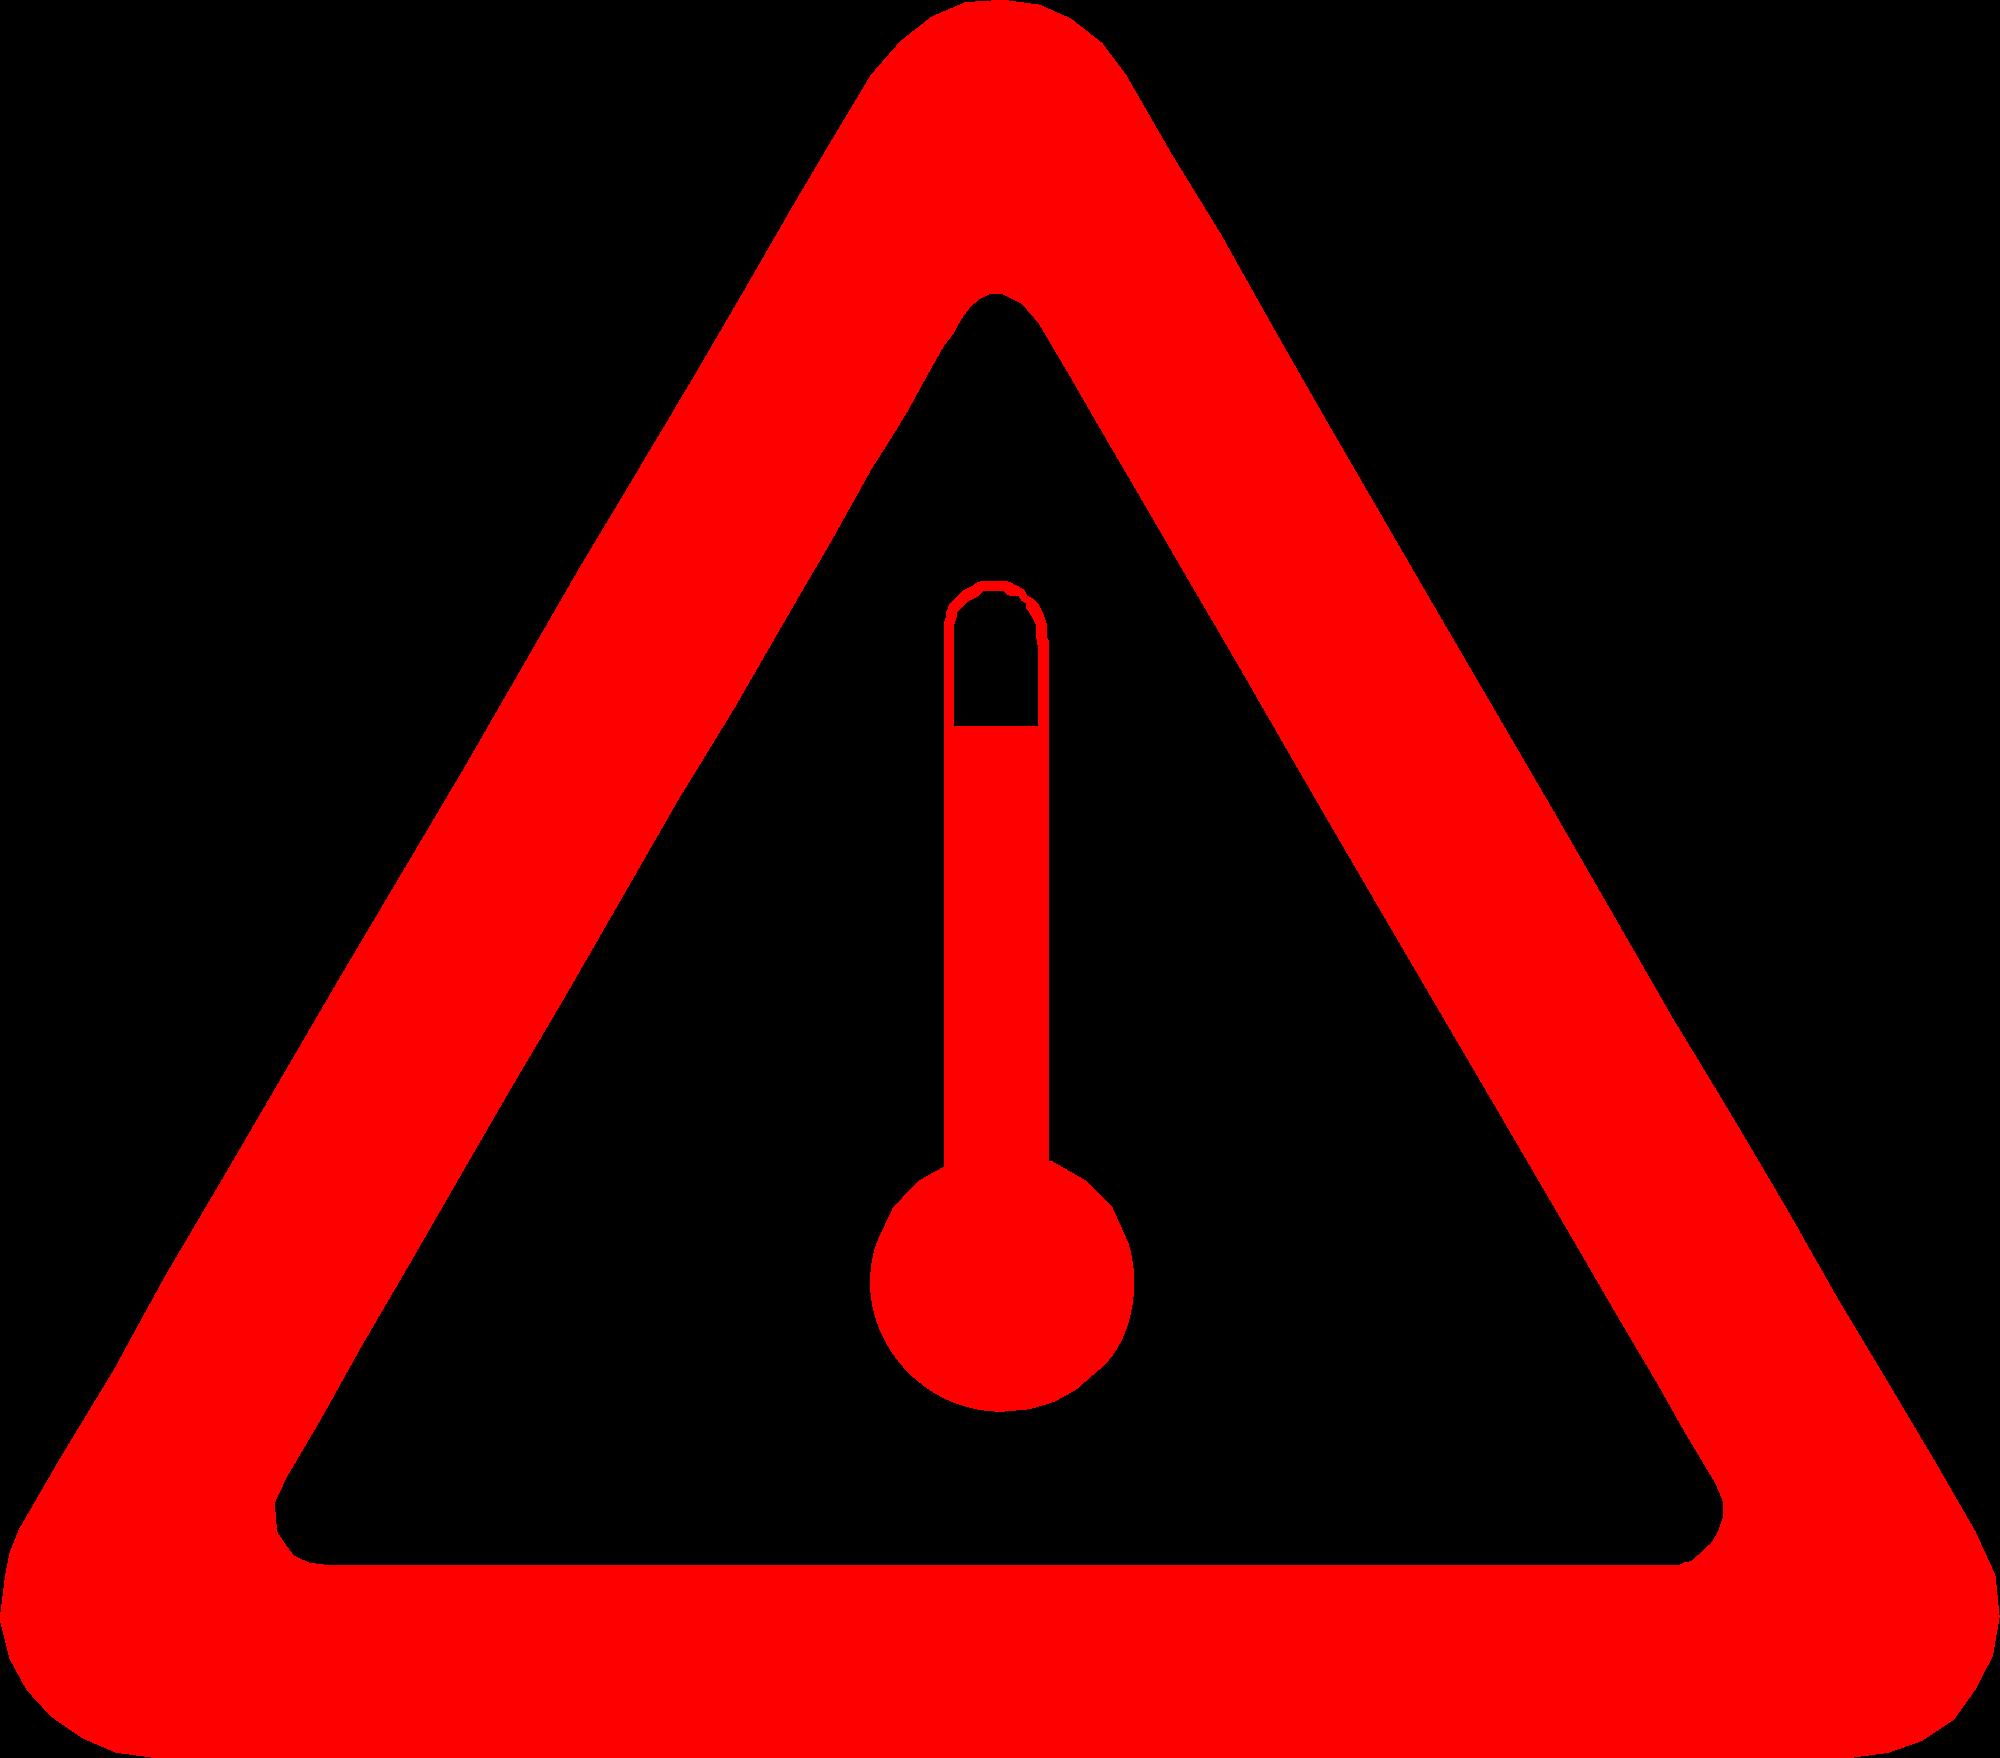 Heat clipart heat stress. North shore health department